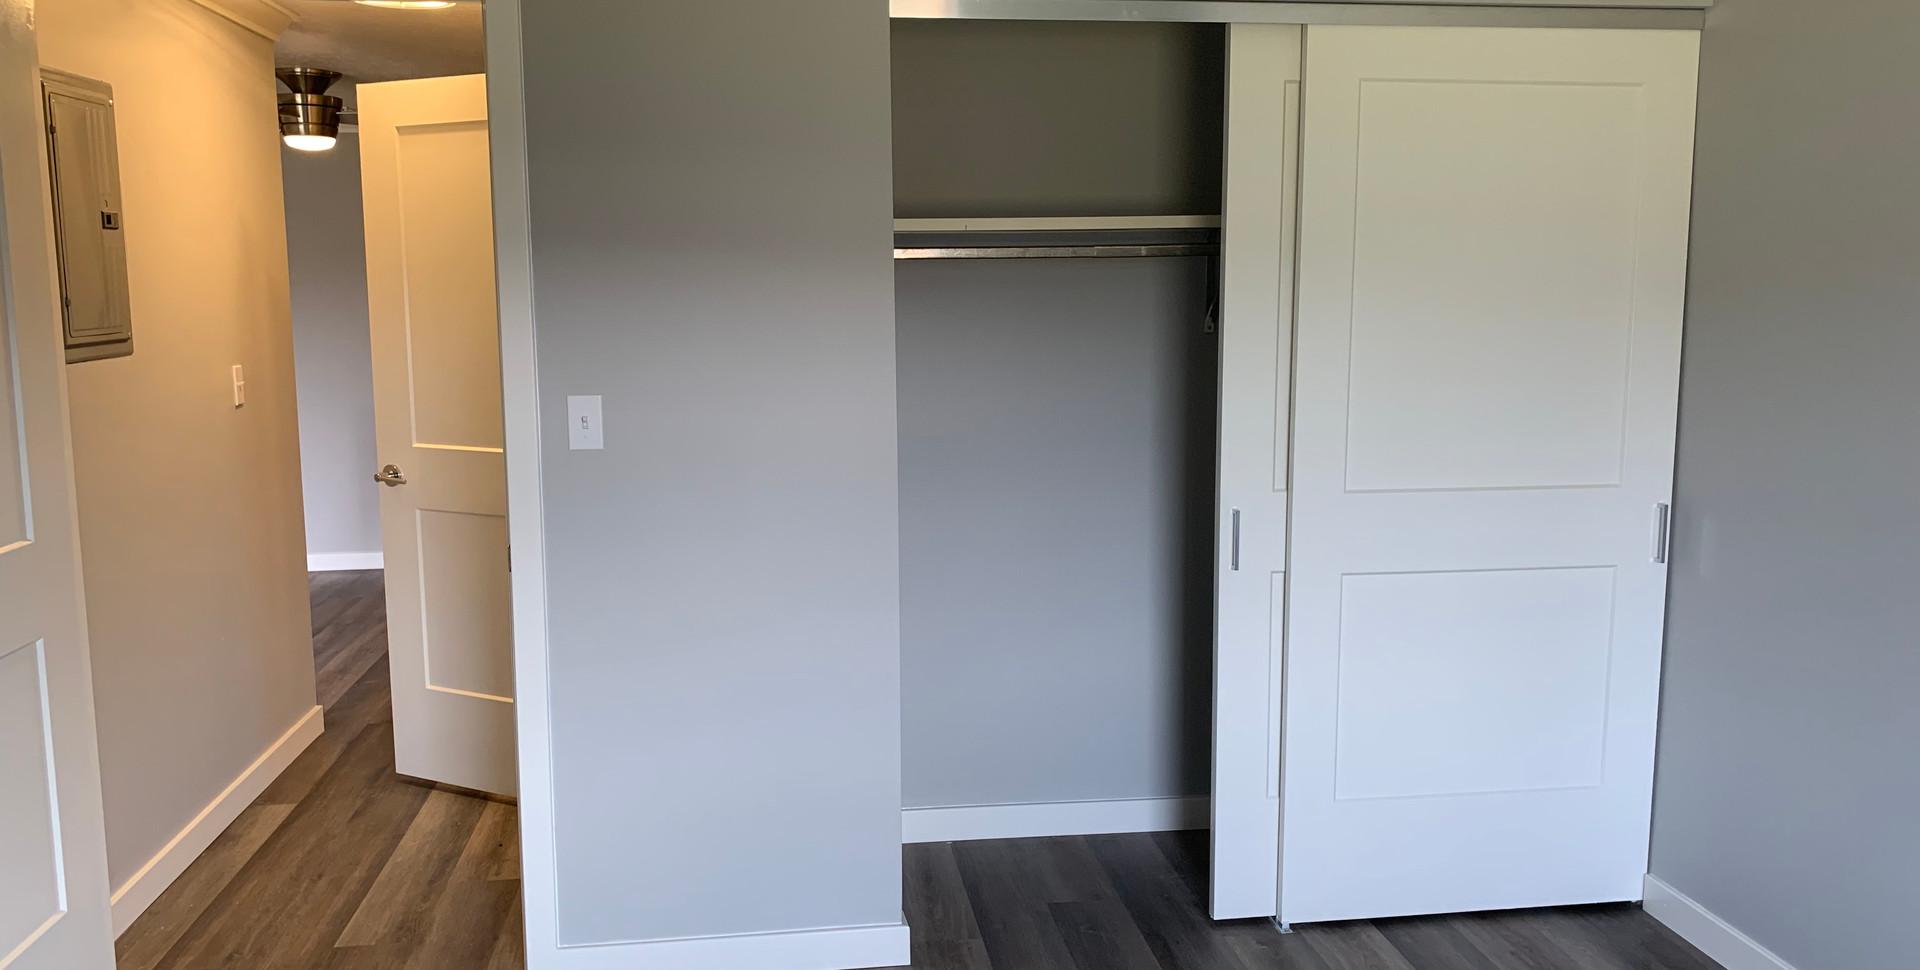 7_Bedroom with closet.jpg